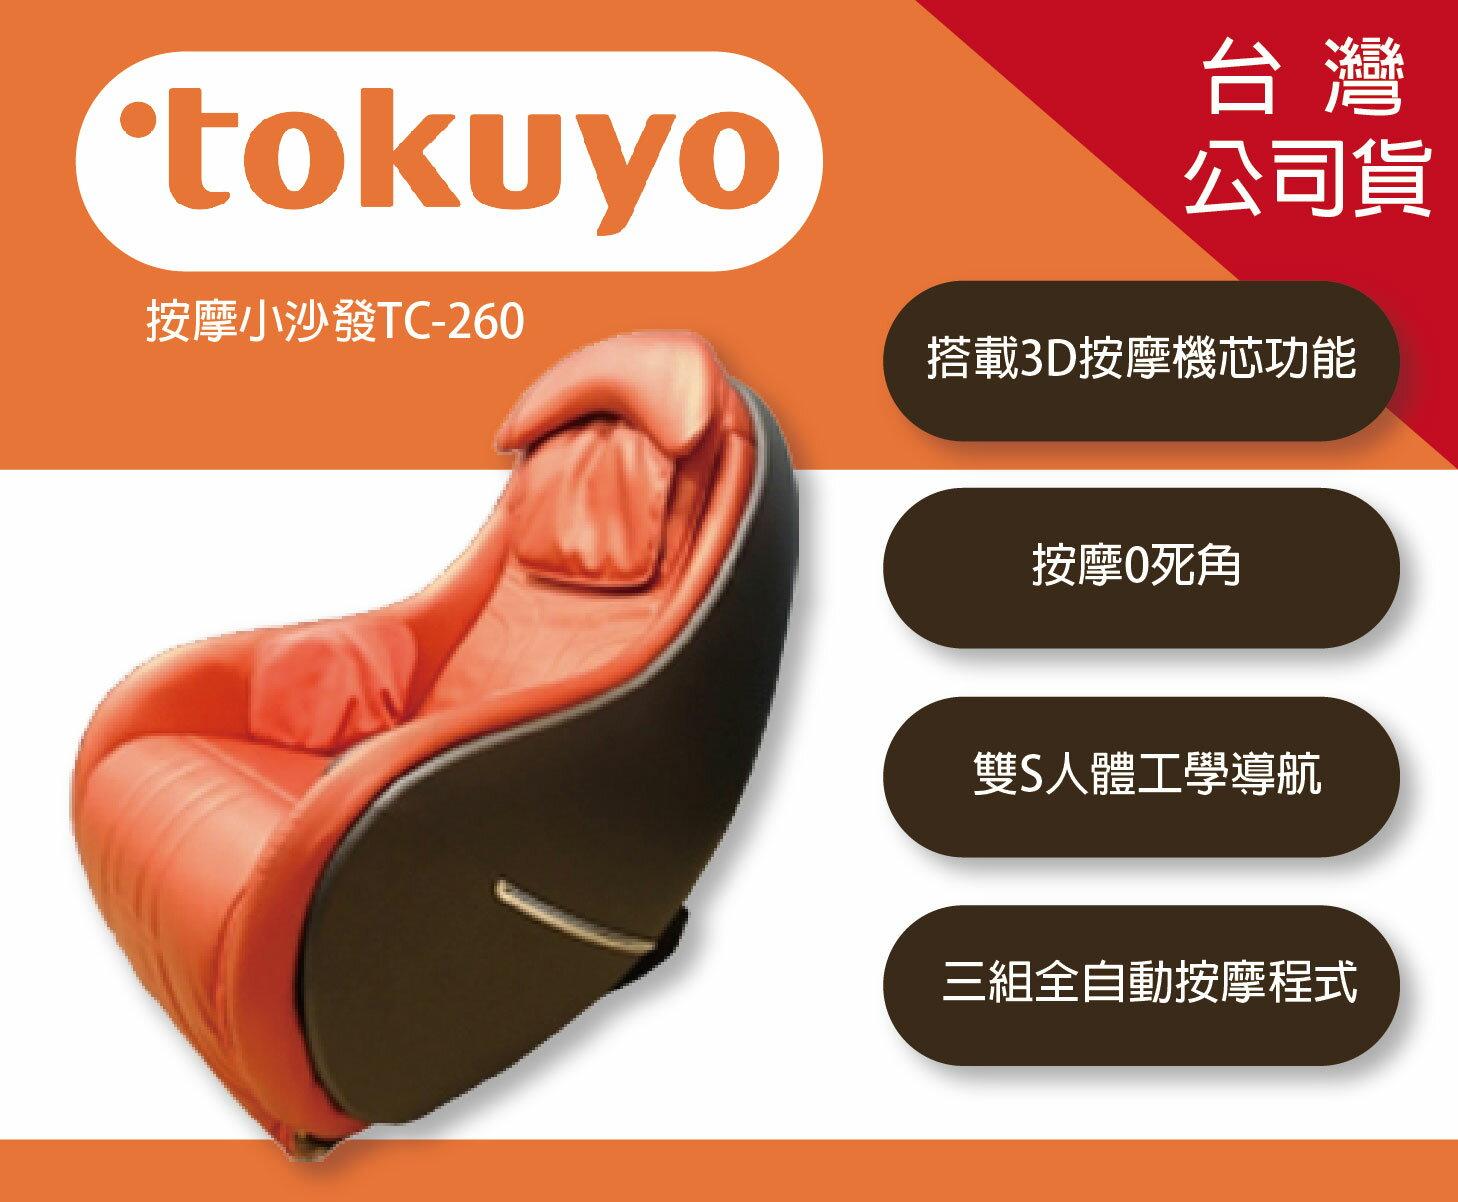 【Tokuyo】按摩小沙發TC-260 (按摩椅 蔡依林代言 台灣公司貨全新未拆封)- 免運宅配